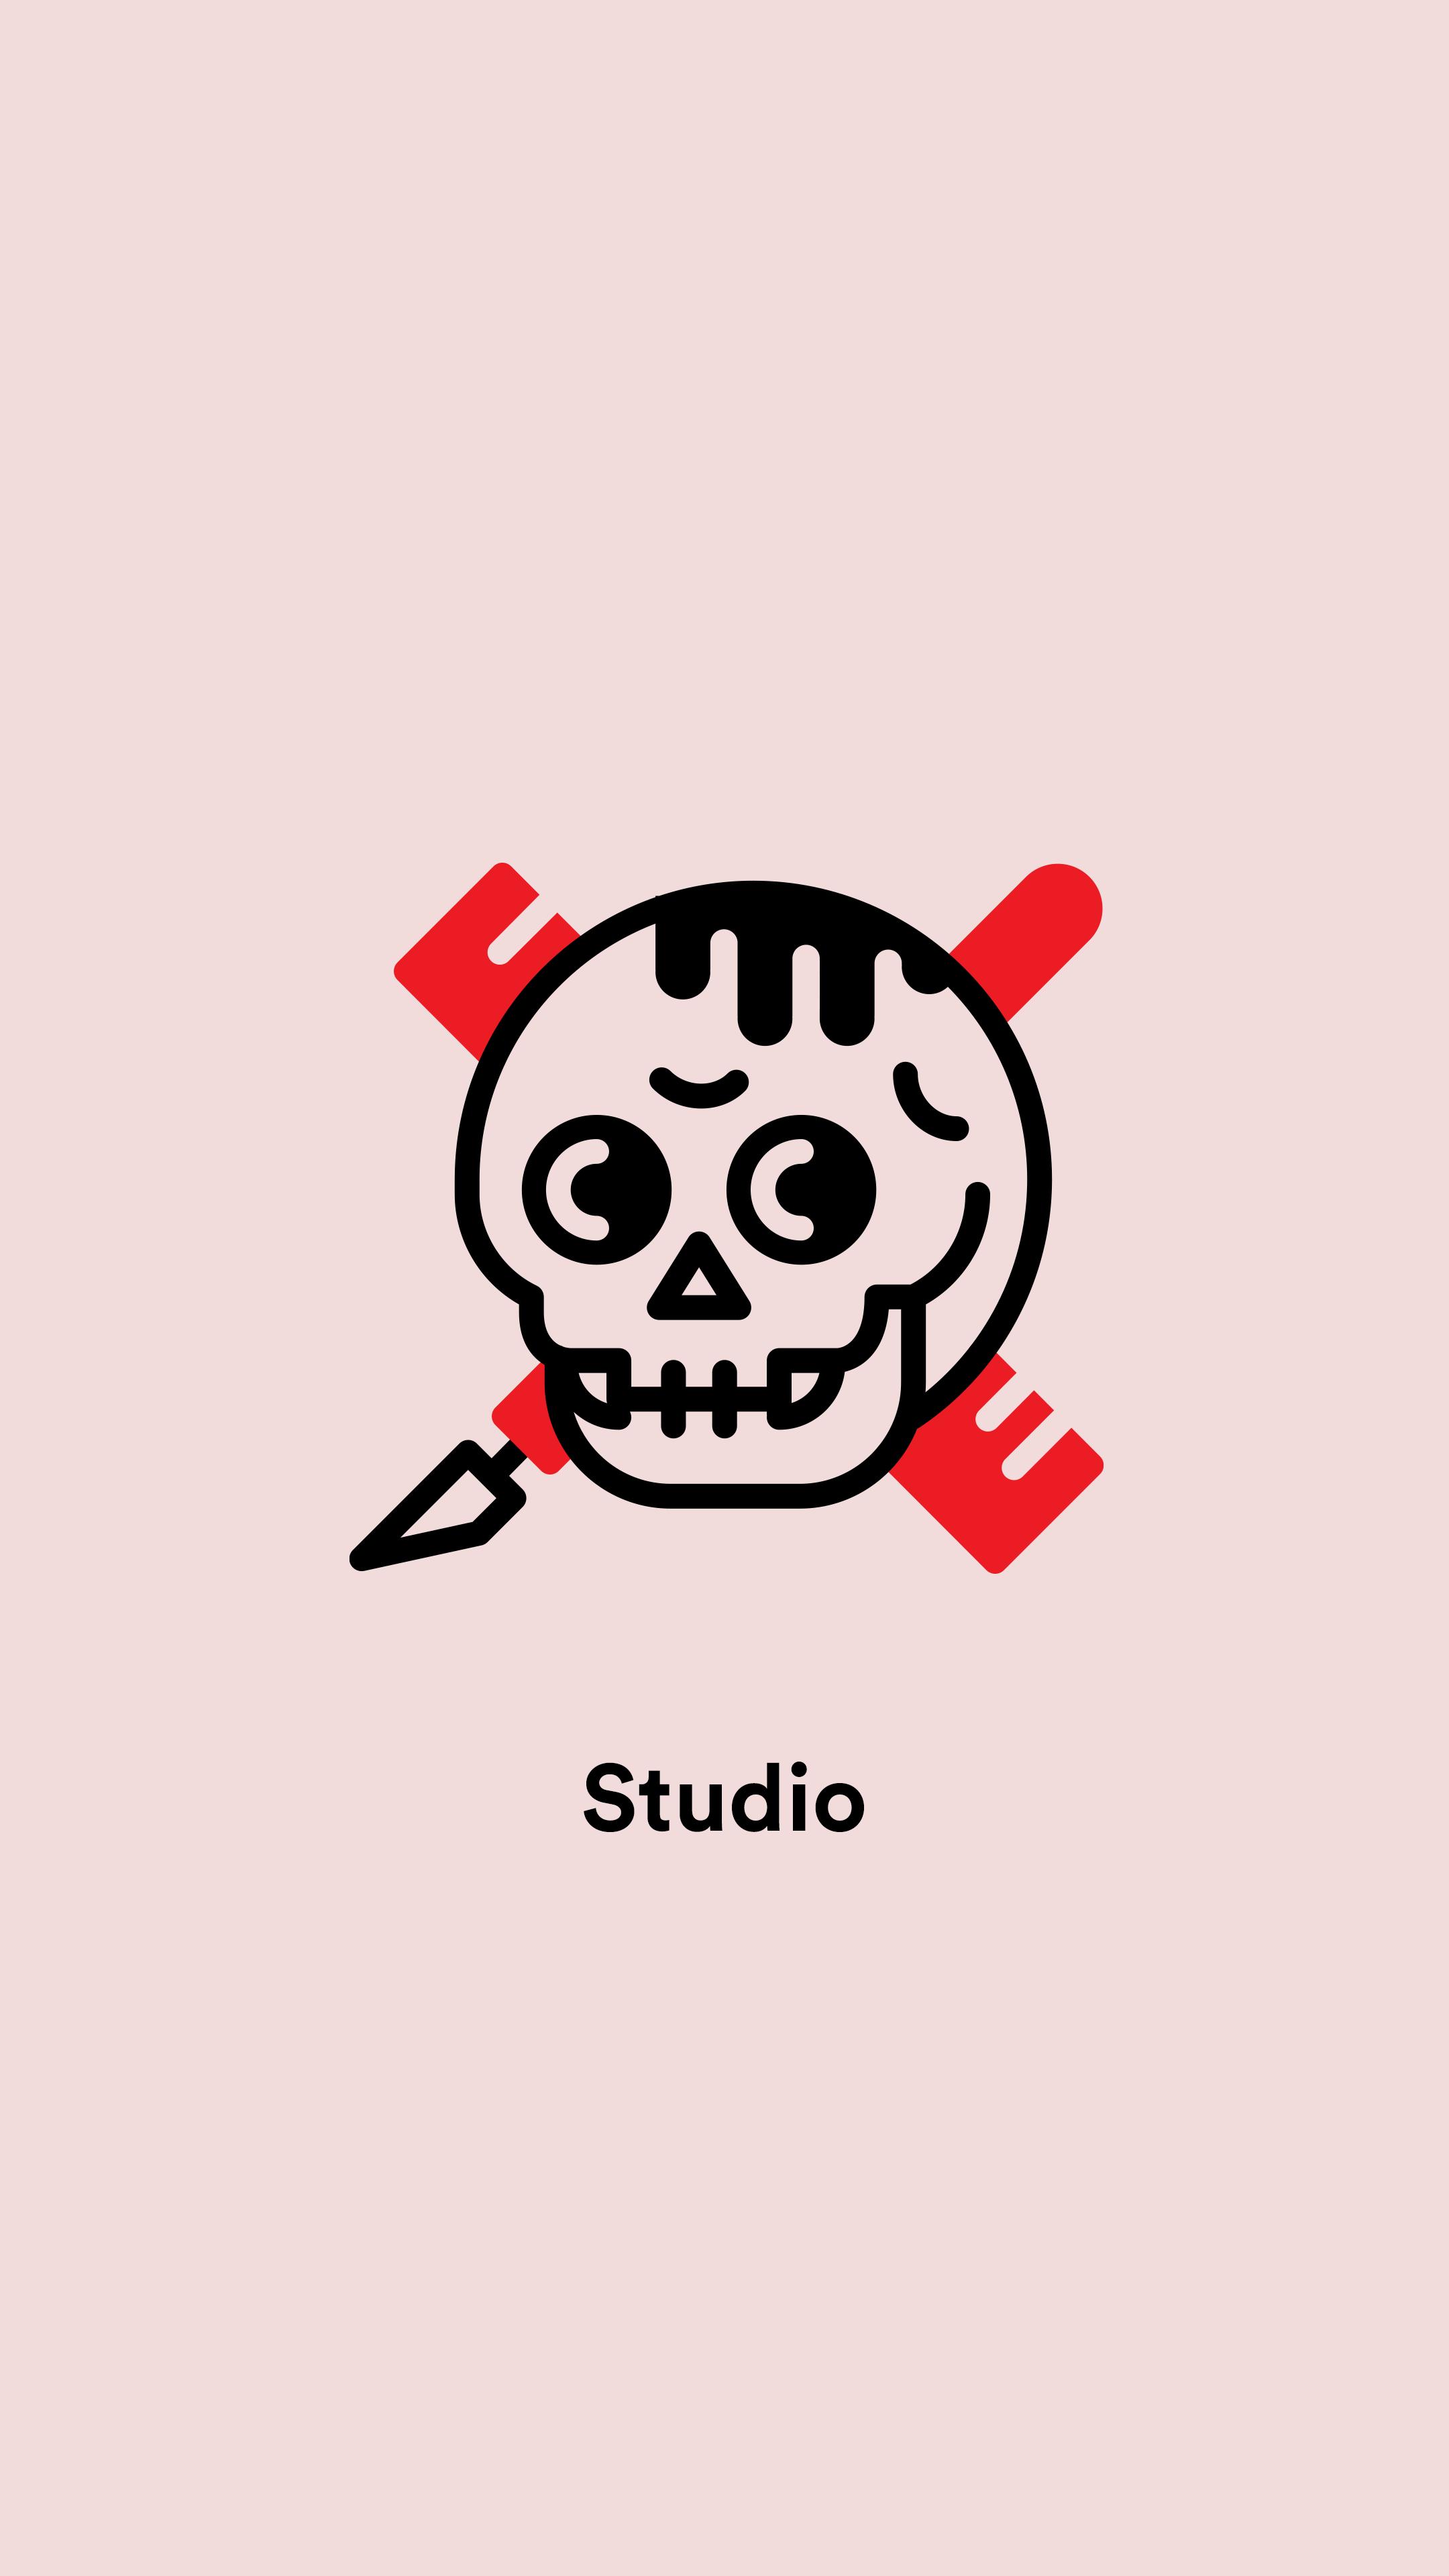 Office Signage For Lola Mullenlowe Paris Illustration Icondesign Studio Production Skull Signage Design Signage Office Signage